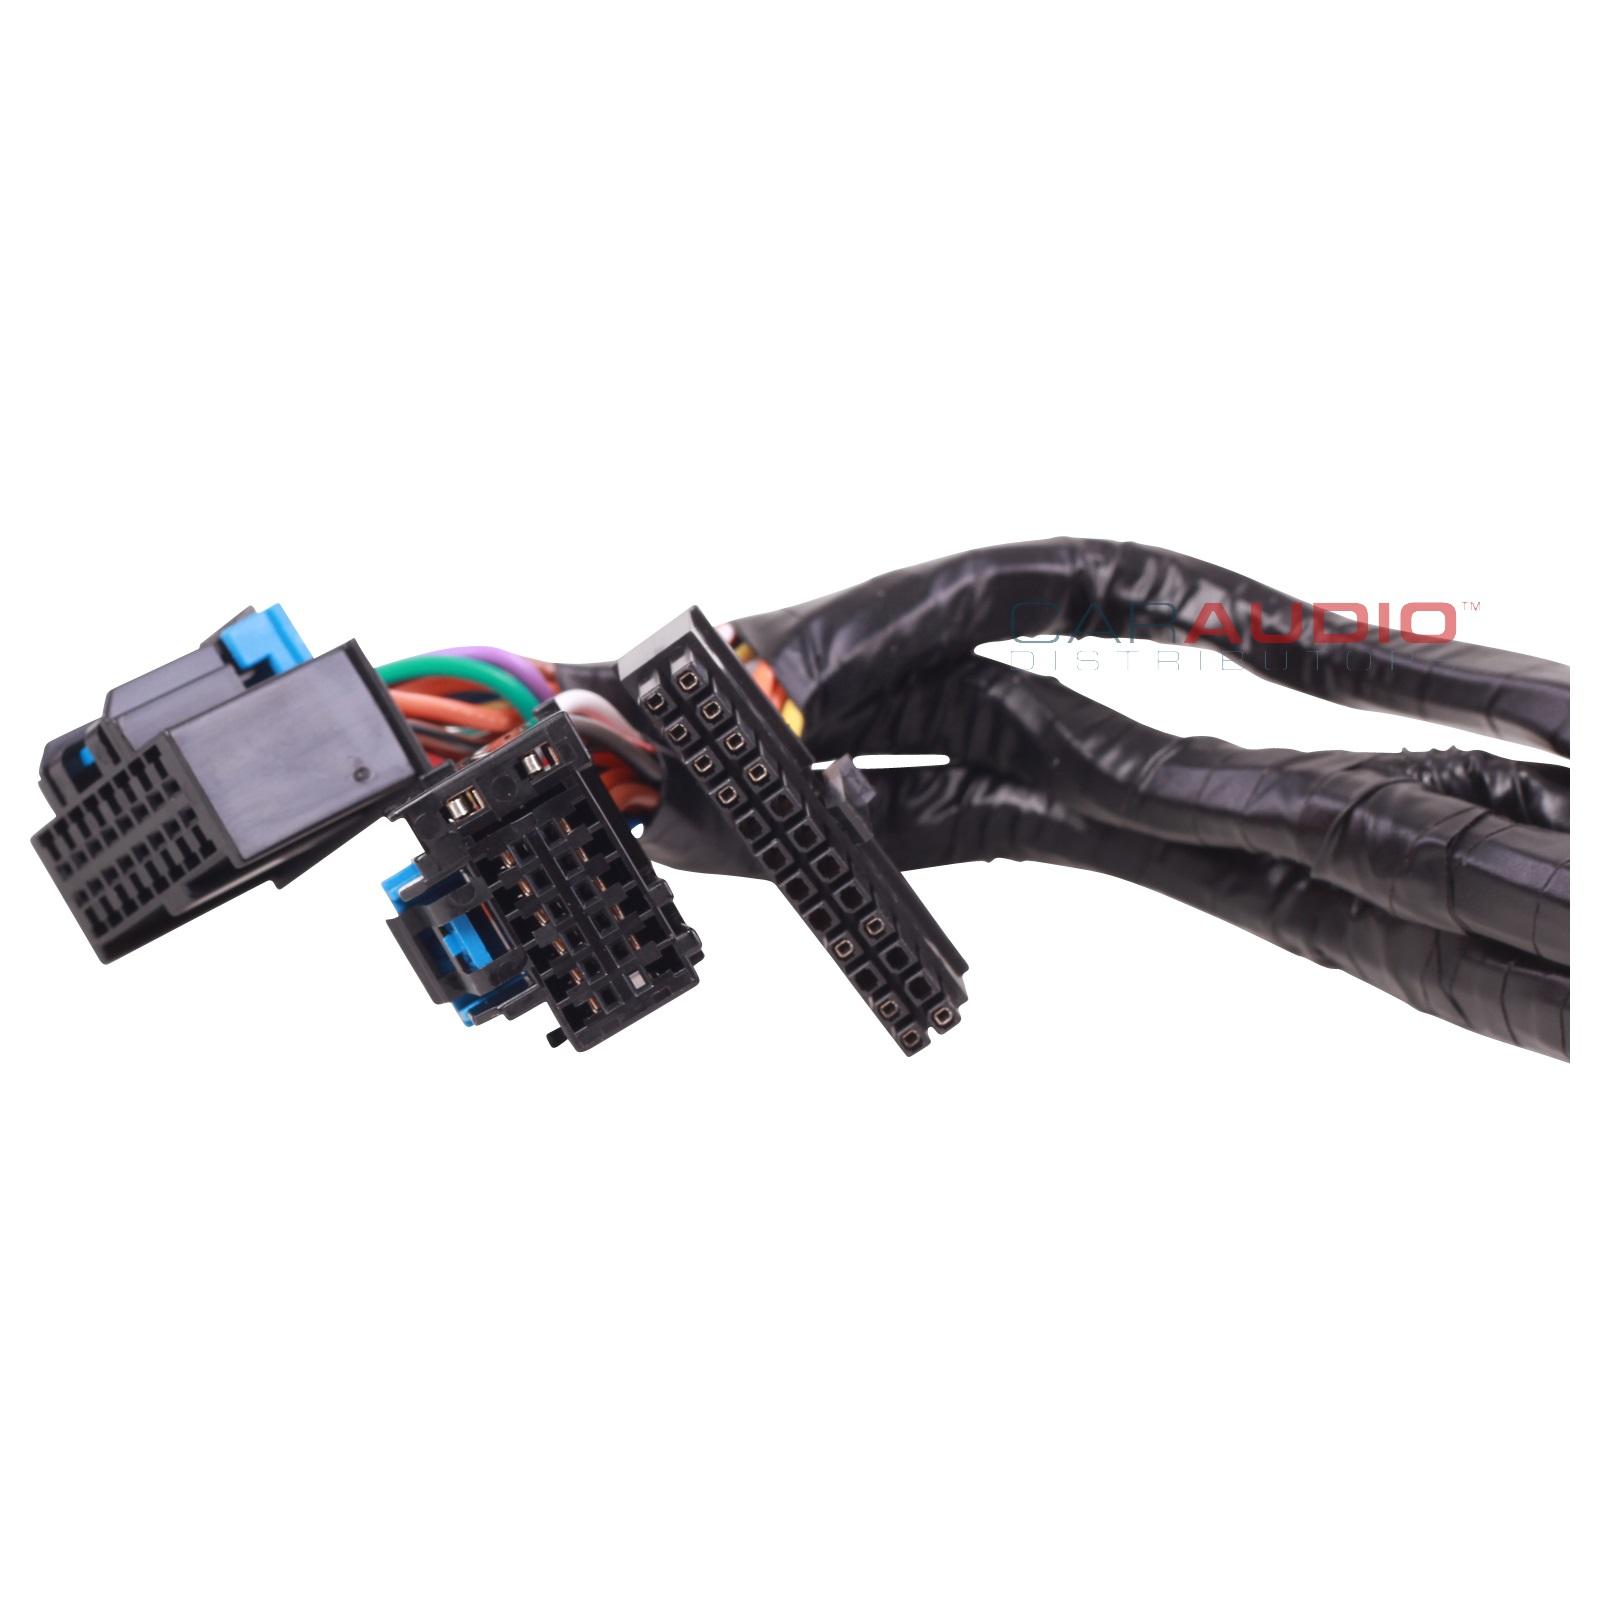 2008 gmc acadia stereo wiring diagram dragonfire active pickups 2015 silverado upgrade autos post